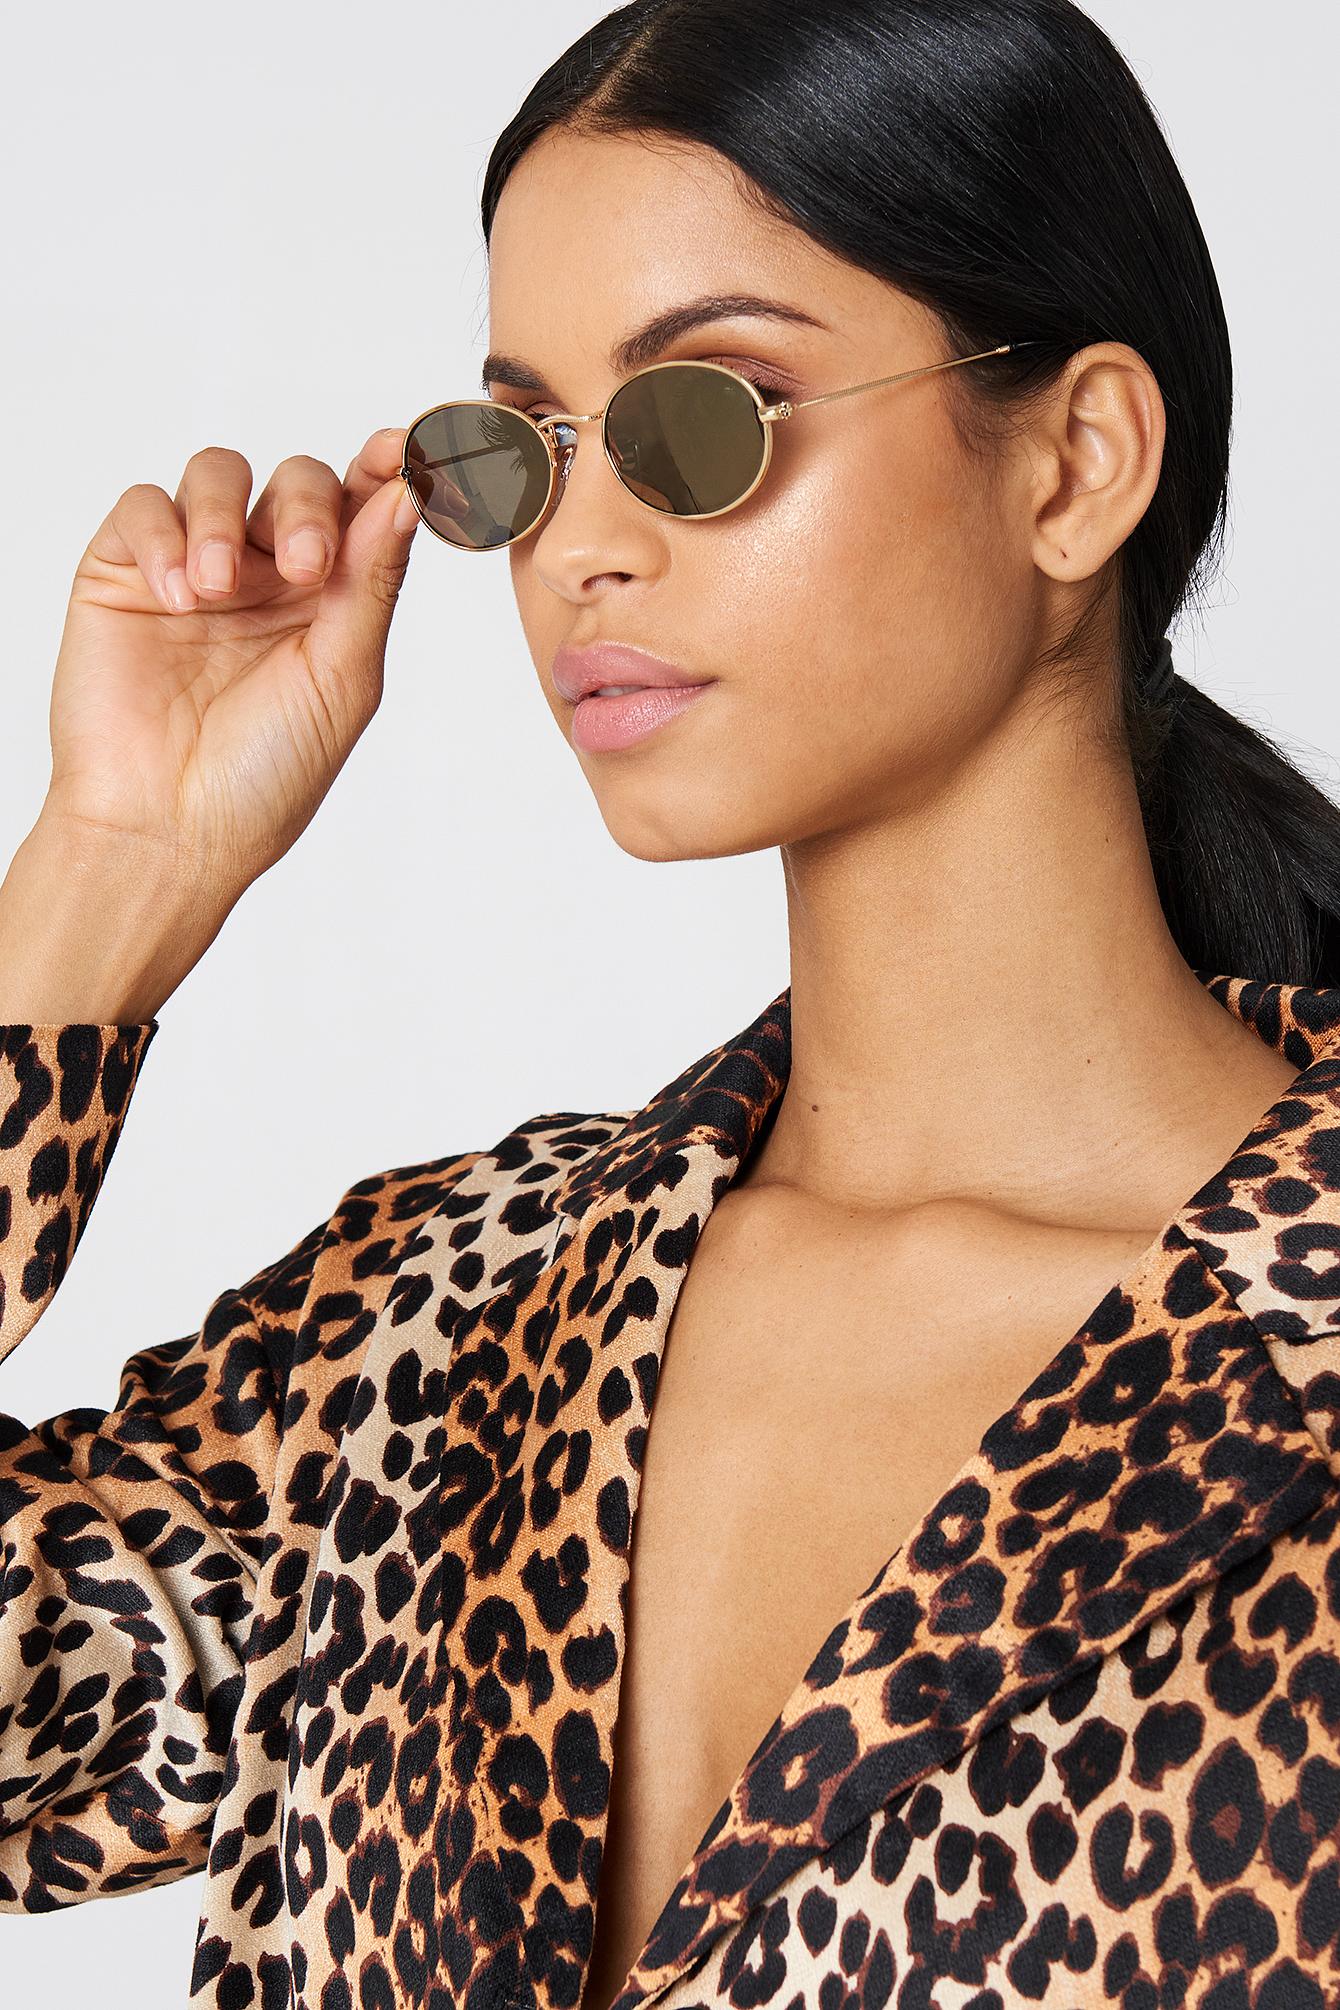 NA-KD Accessories Oval Metal Sunglasses - Gold 59jFcem